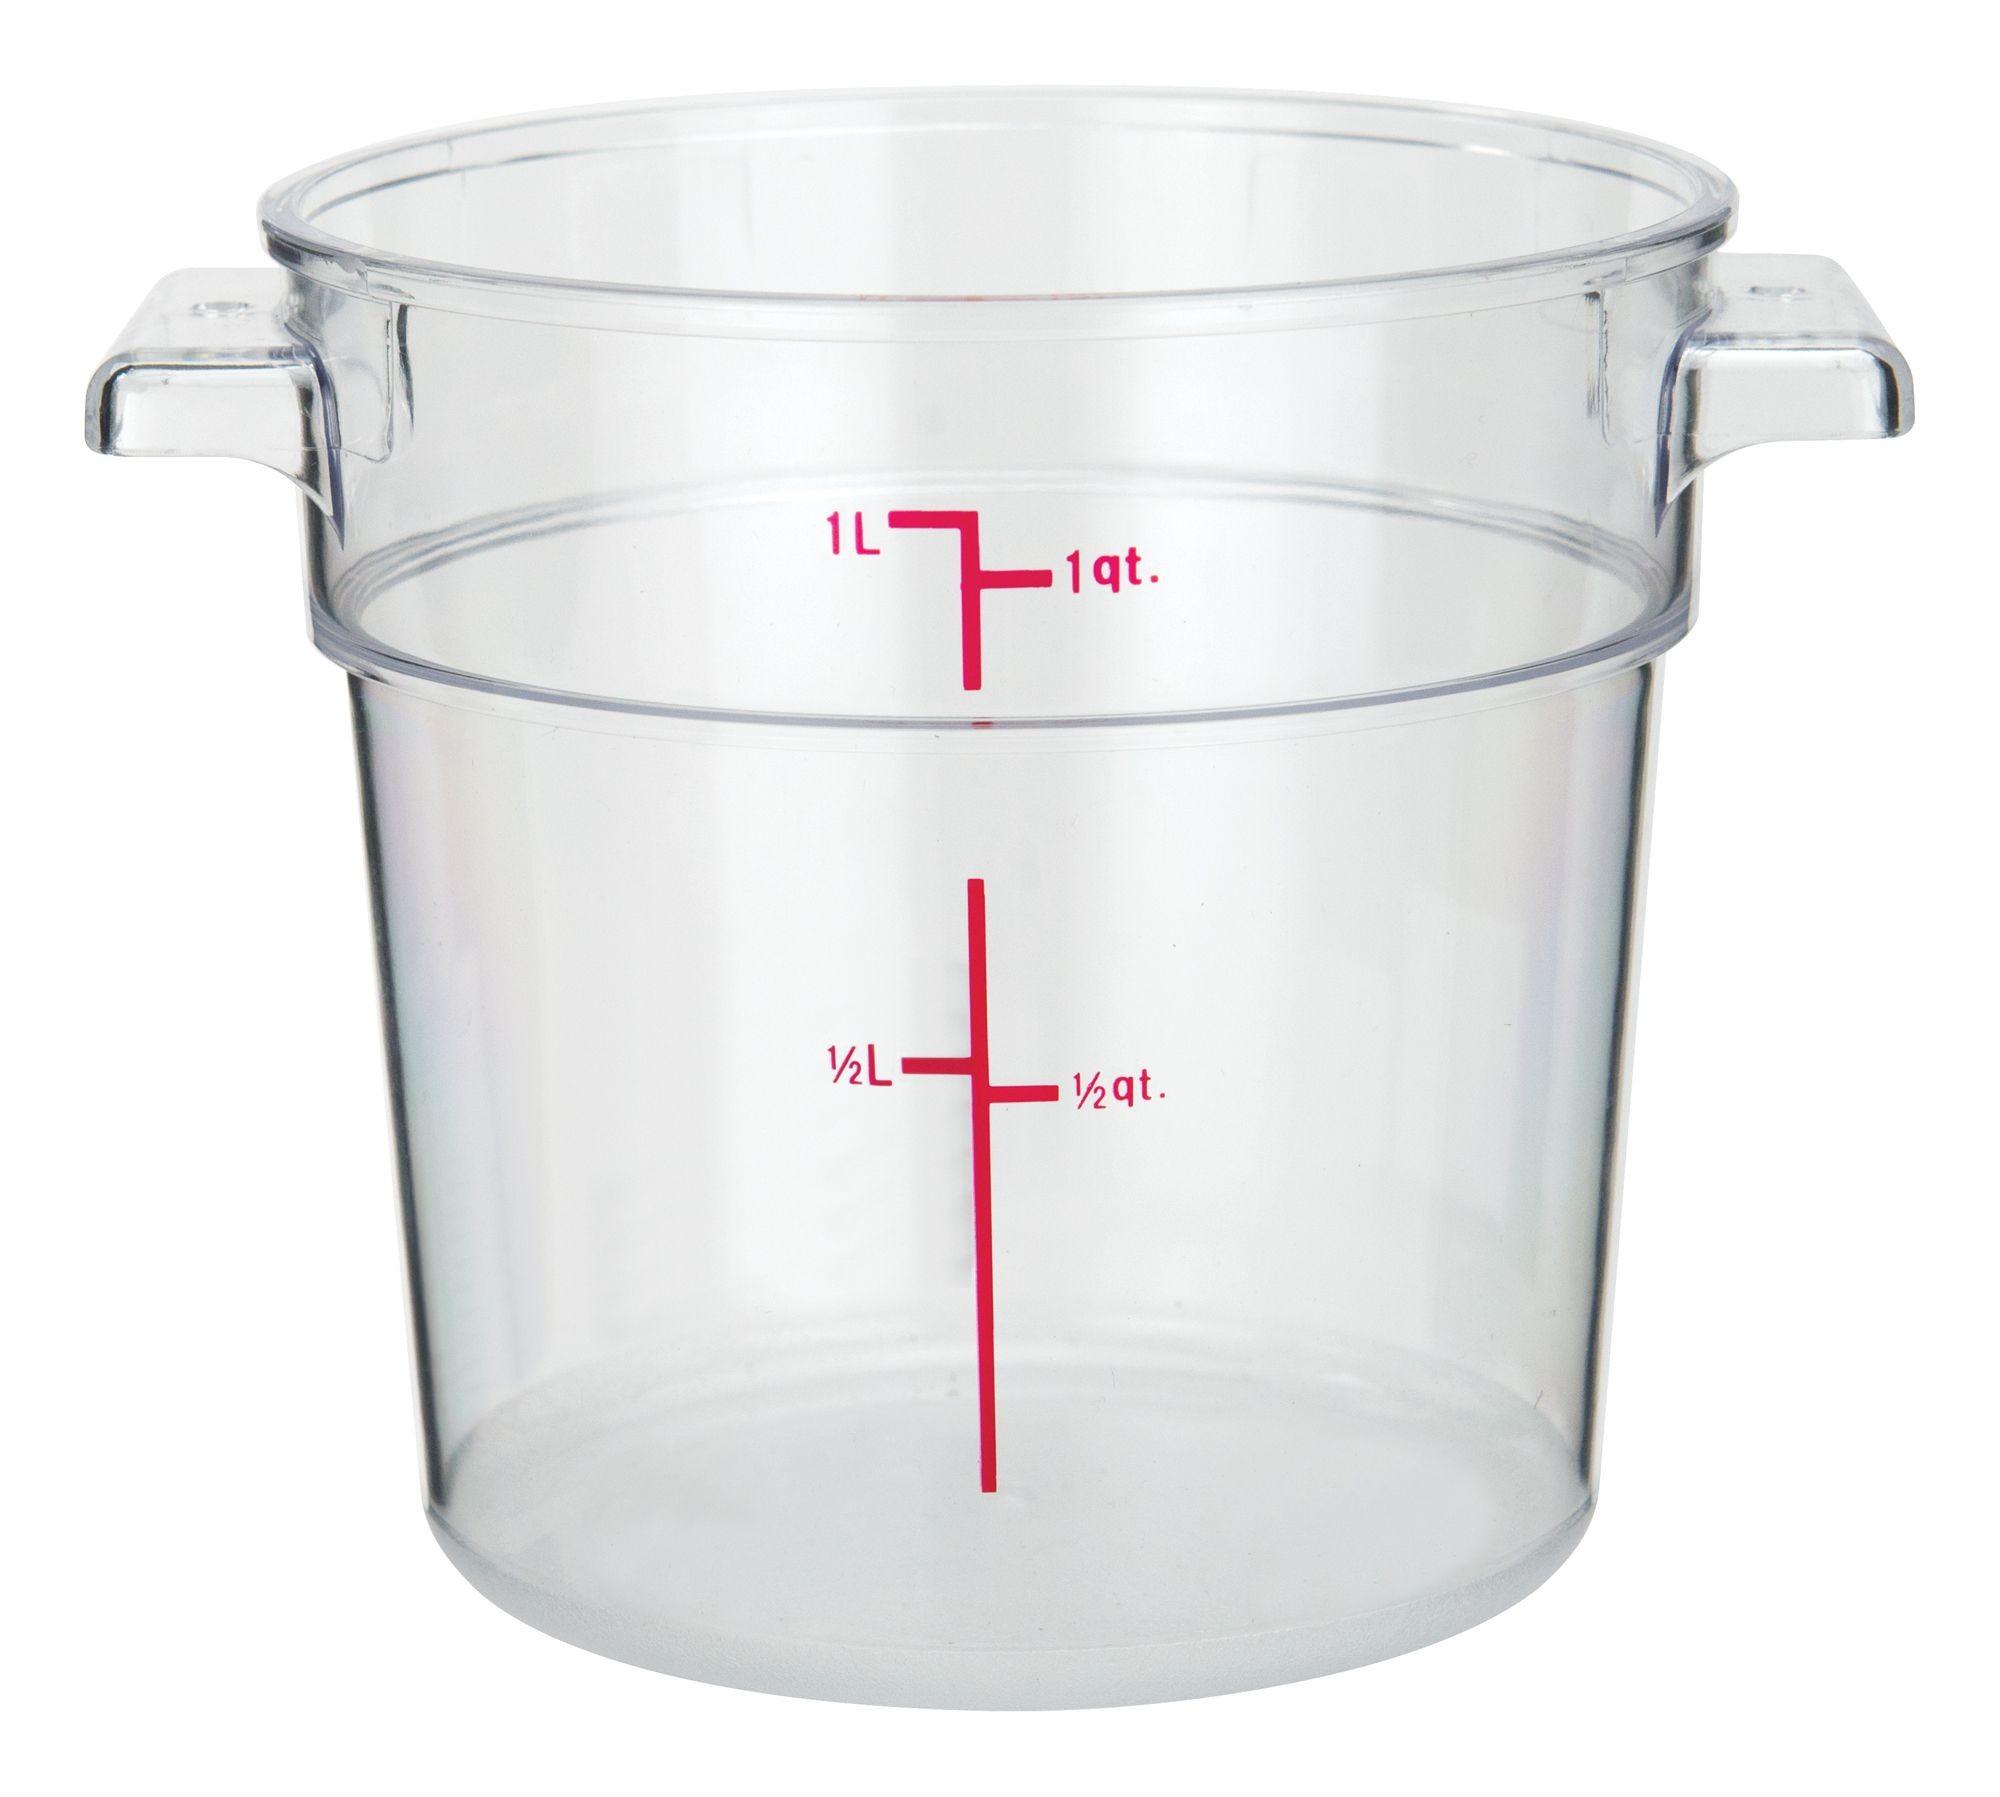 Winco PCRC-1 Round Polycarbonate Storage Container, 1 Qt.